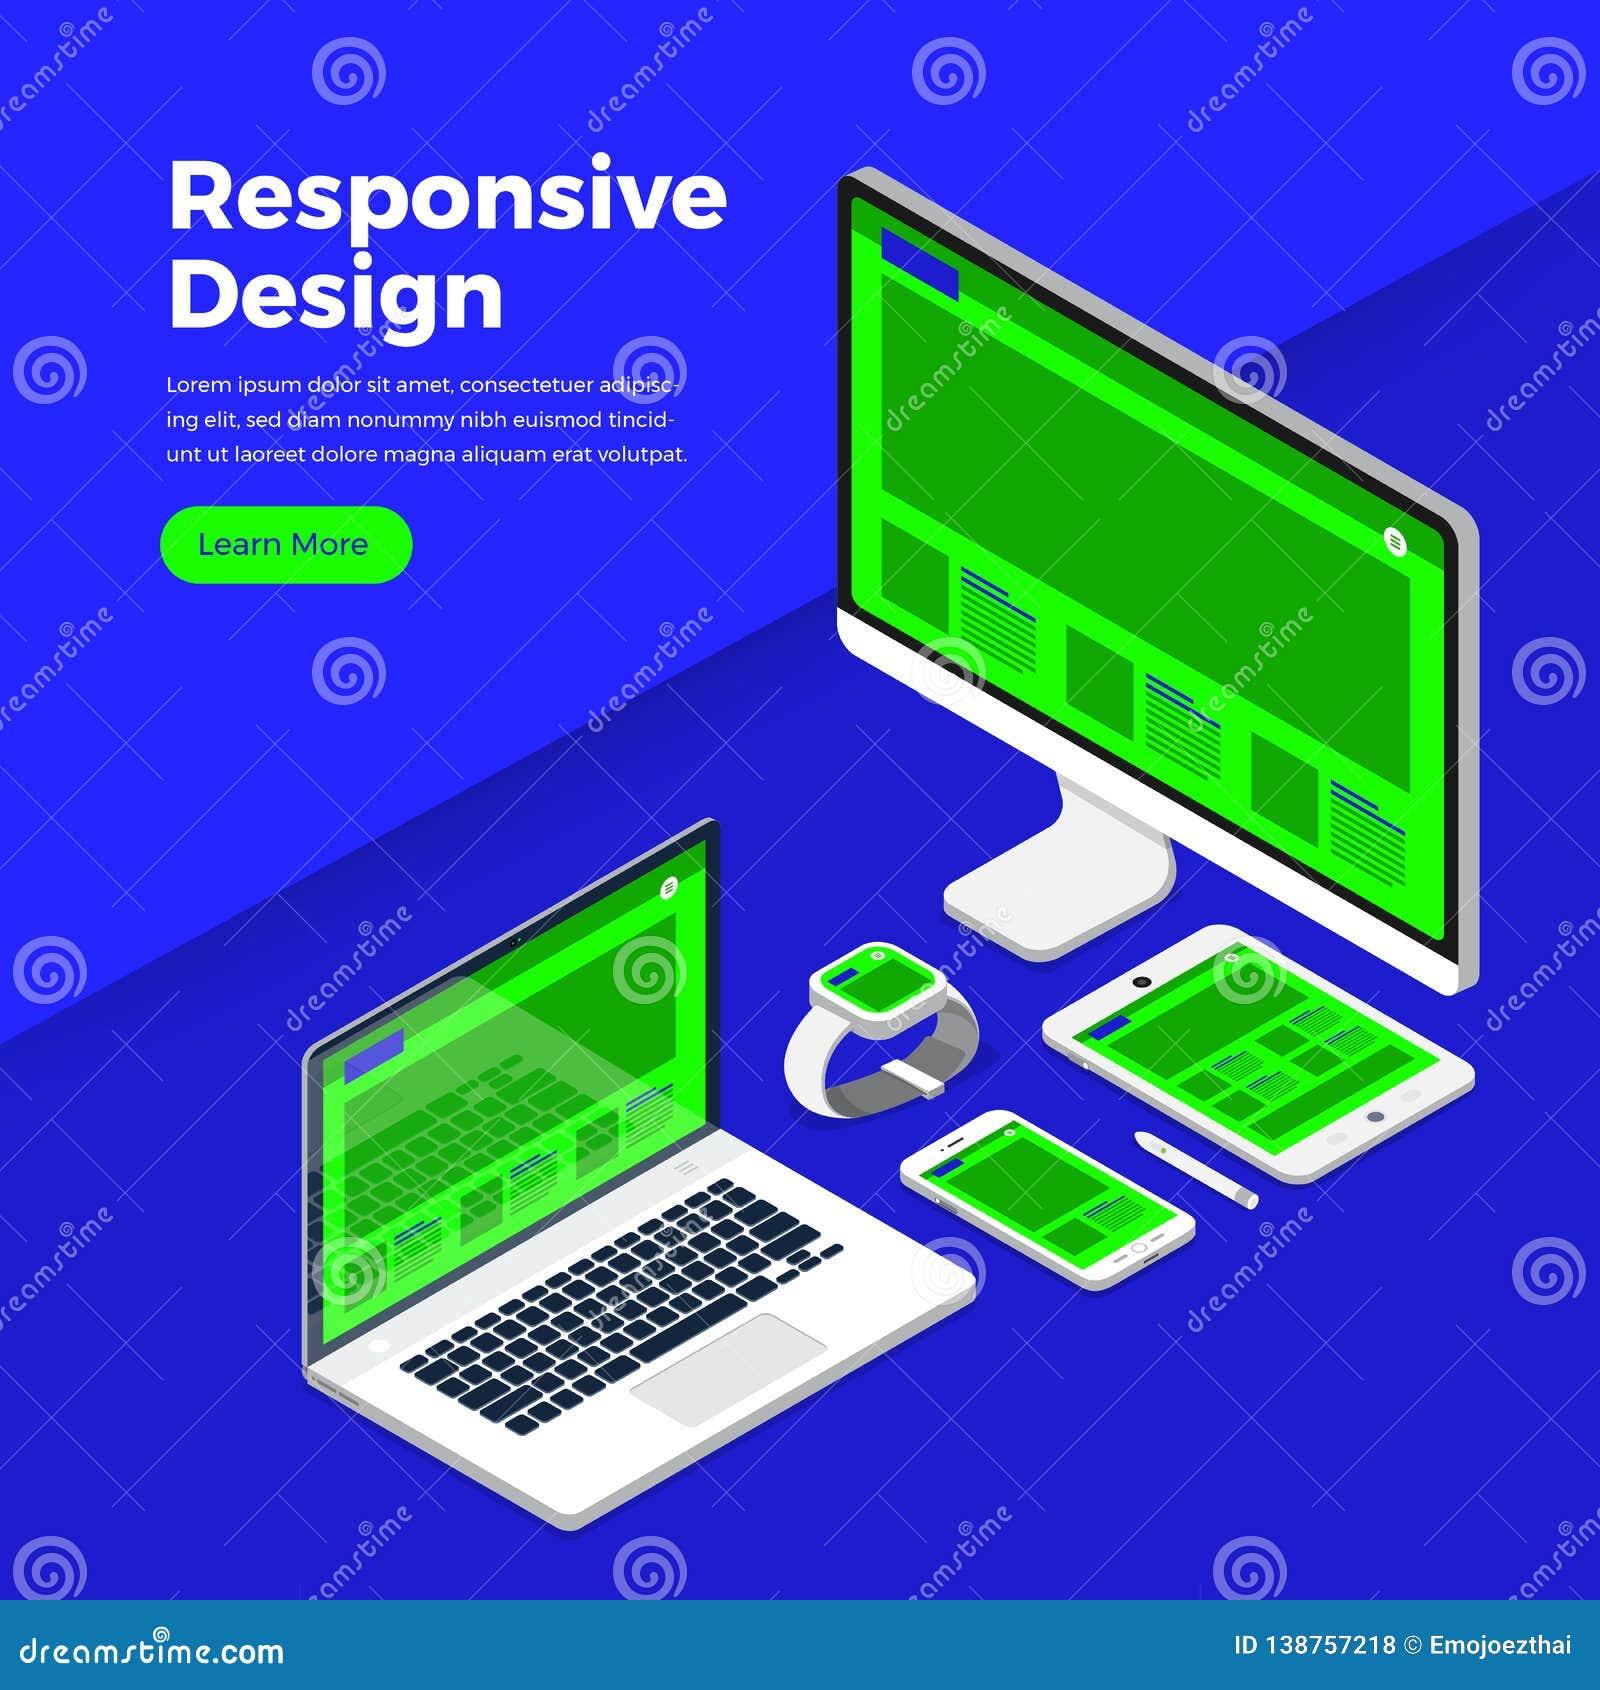 Flat Style Responsive Webdesign Technology Stock Vector: Isometric Flat Design Concept Responsive Design. Mockup